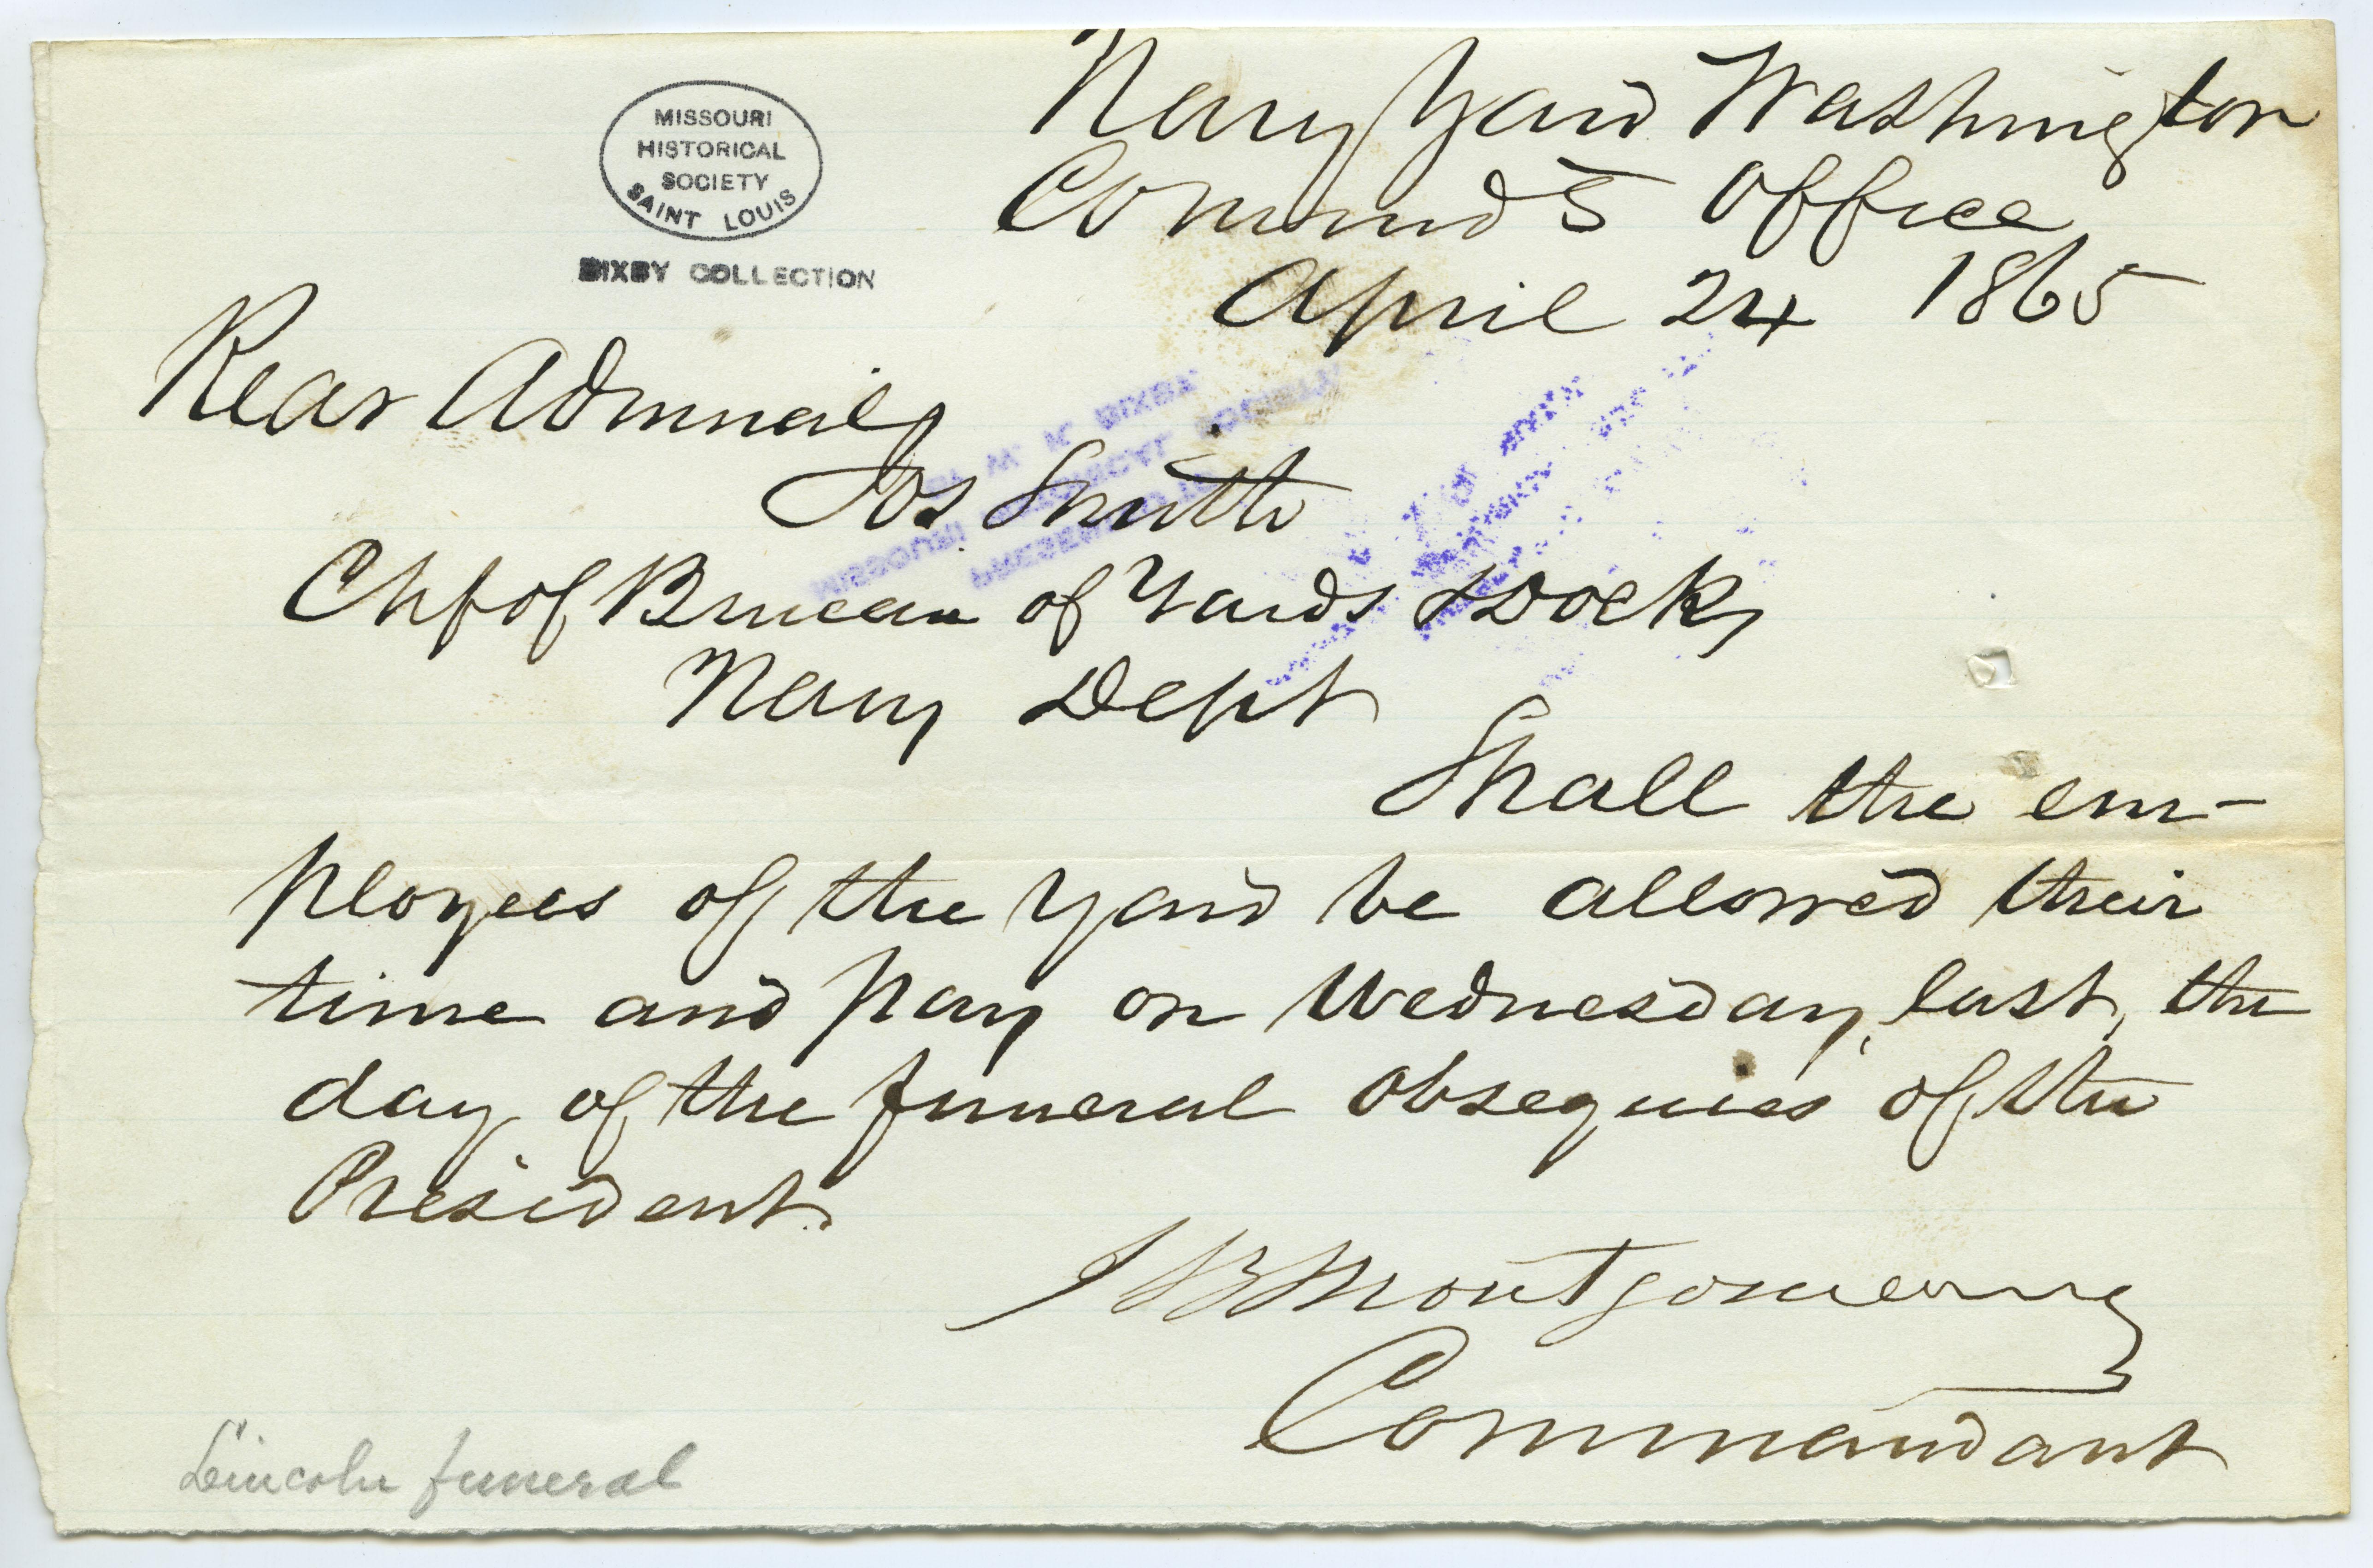 Contemporary copy of telegram of J.B. Montgomery, Commandant, Navy Yard, Washington, Commdt. Office, to Rear Admiral Jos. Smith [Joseph Smith], Chief of Bureau of Yards and Docks, Navy Dept., April 24, 1865